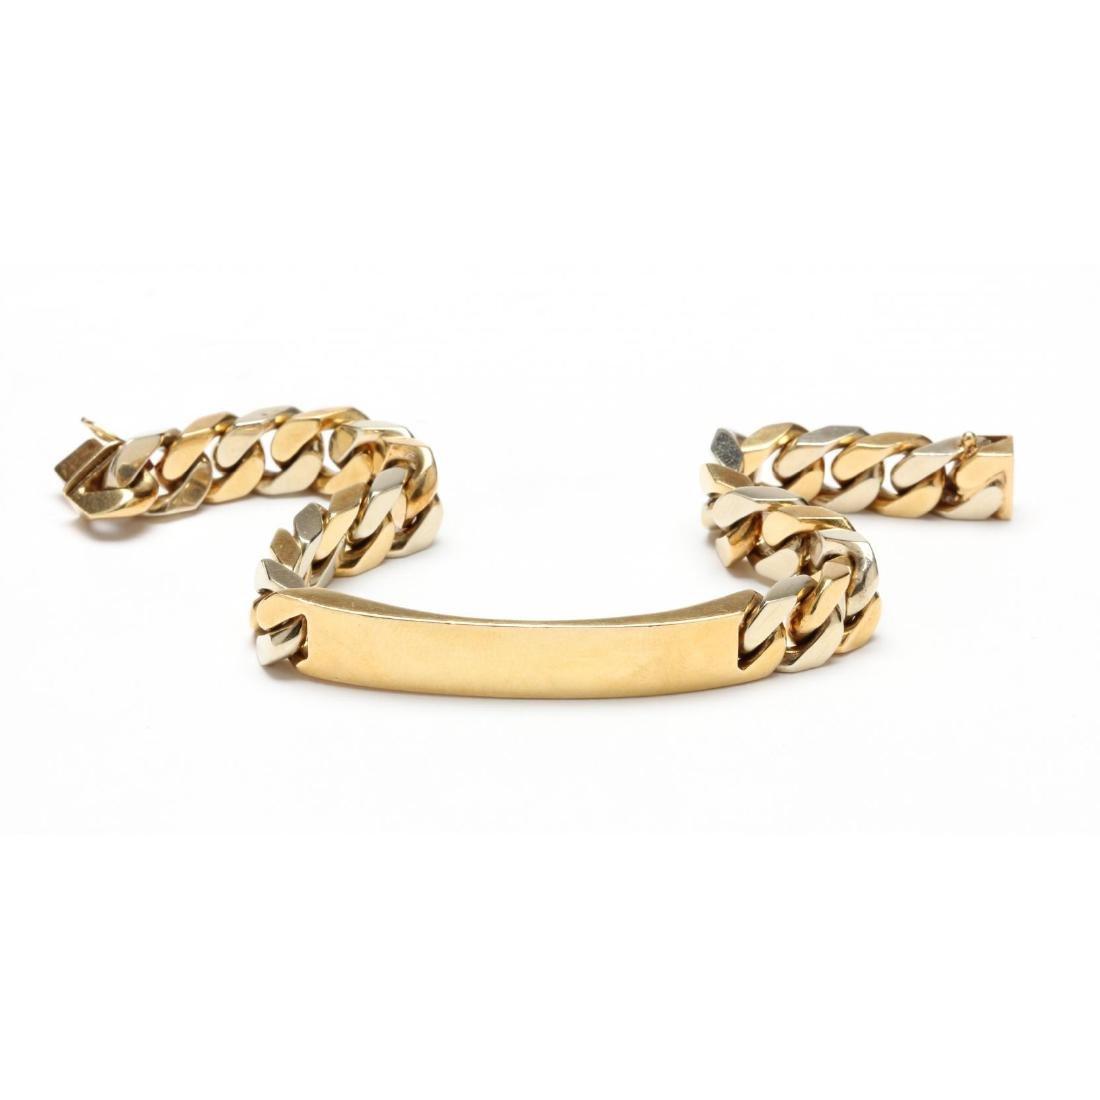 18KT Two Tone Gold ID Bracelet, Bulgari